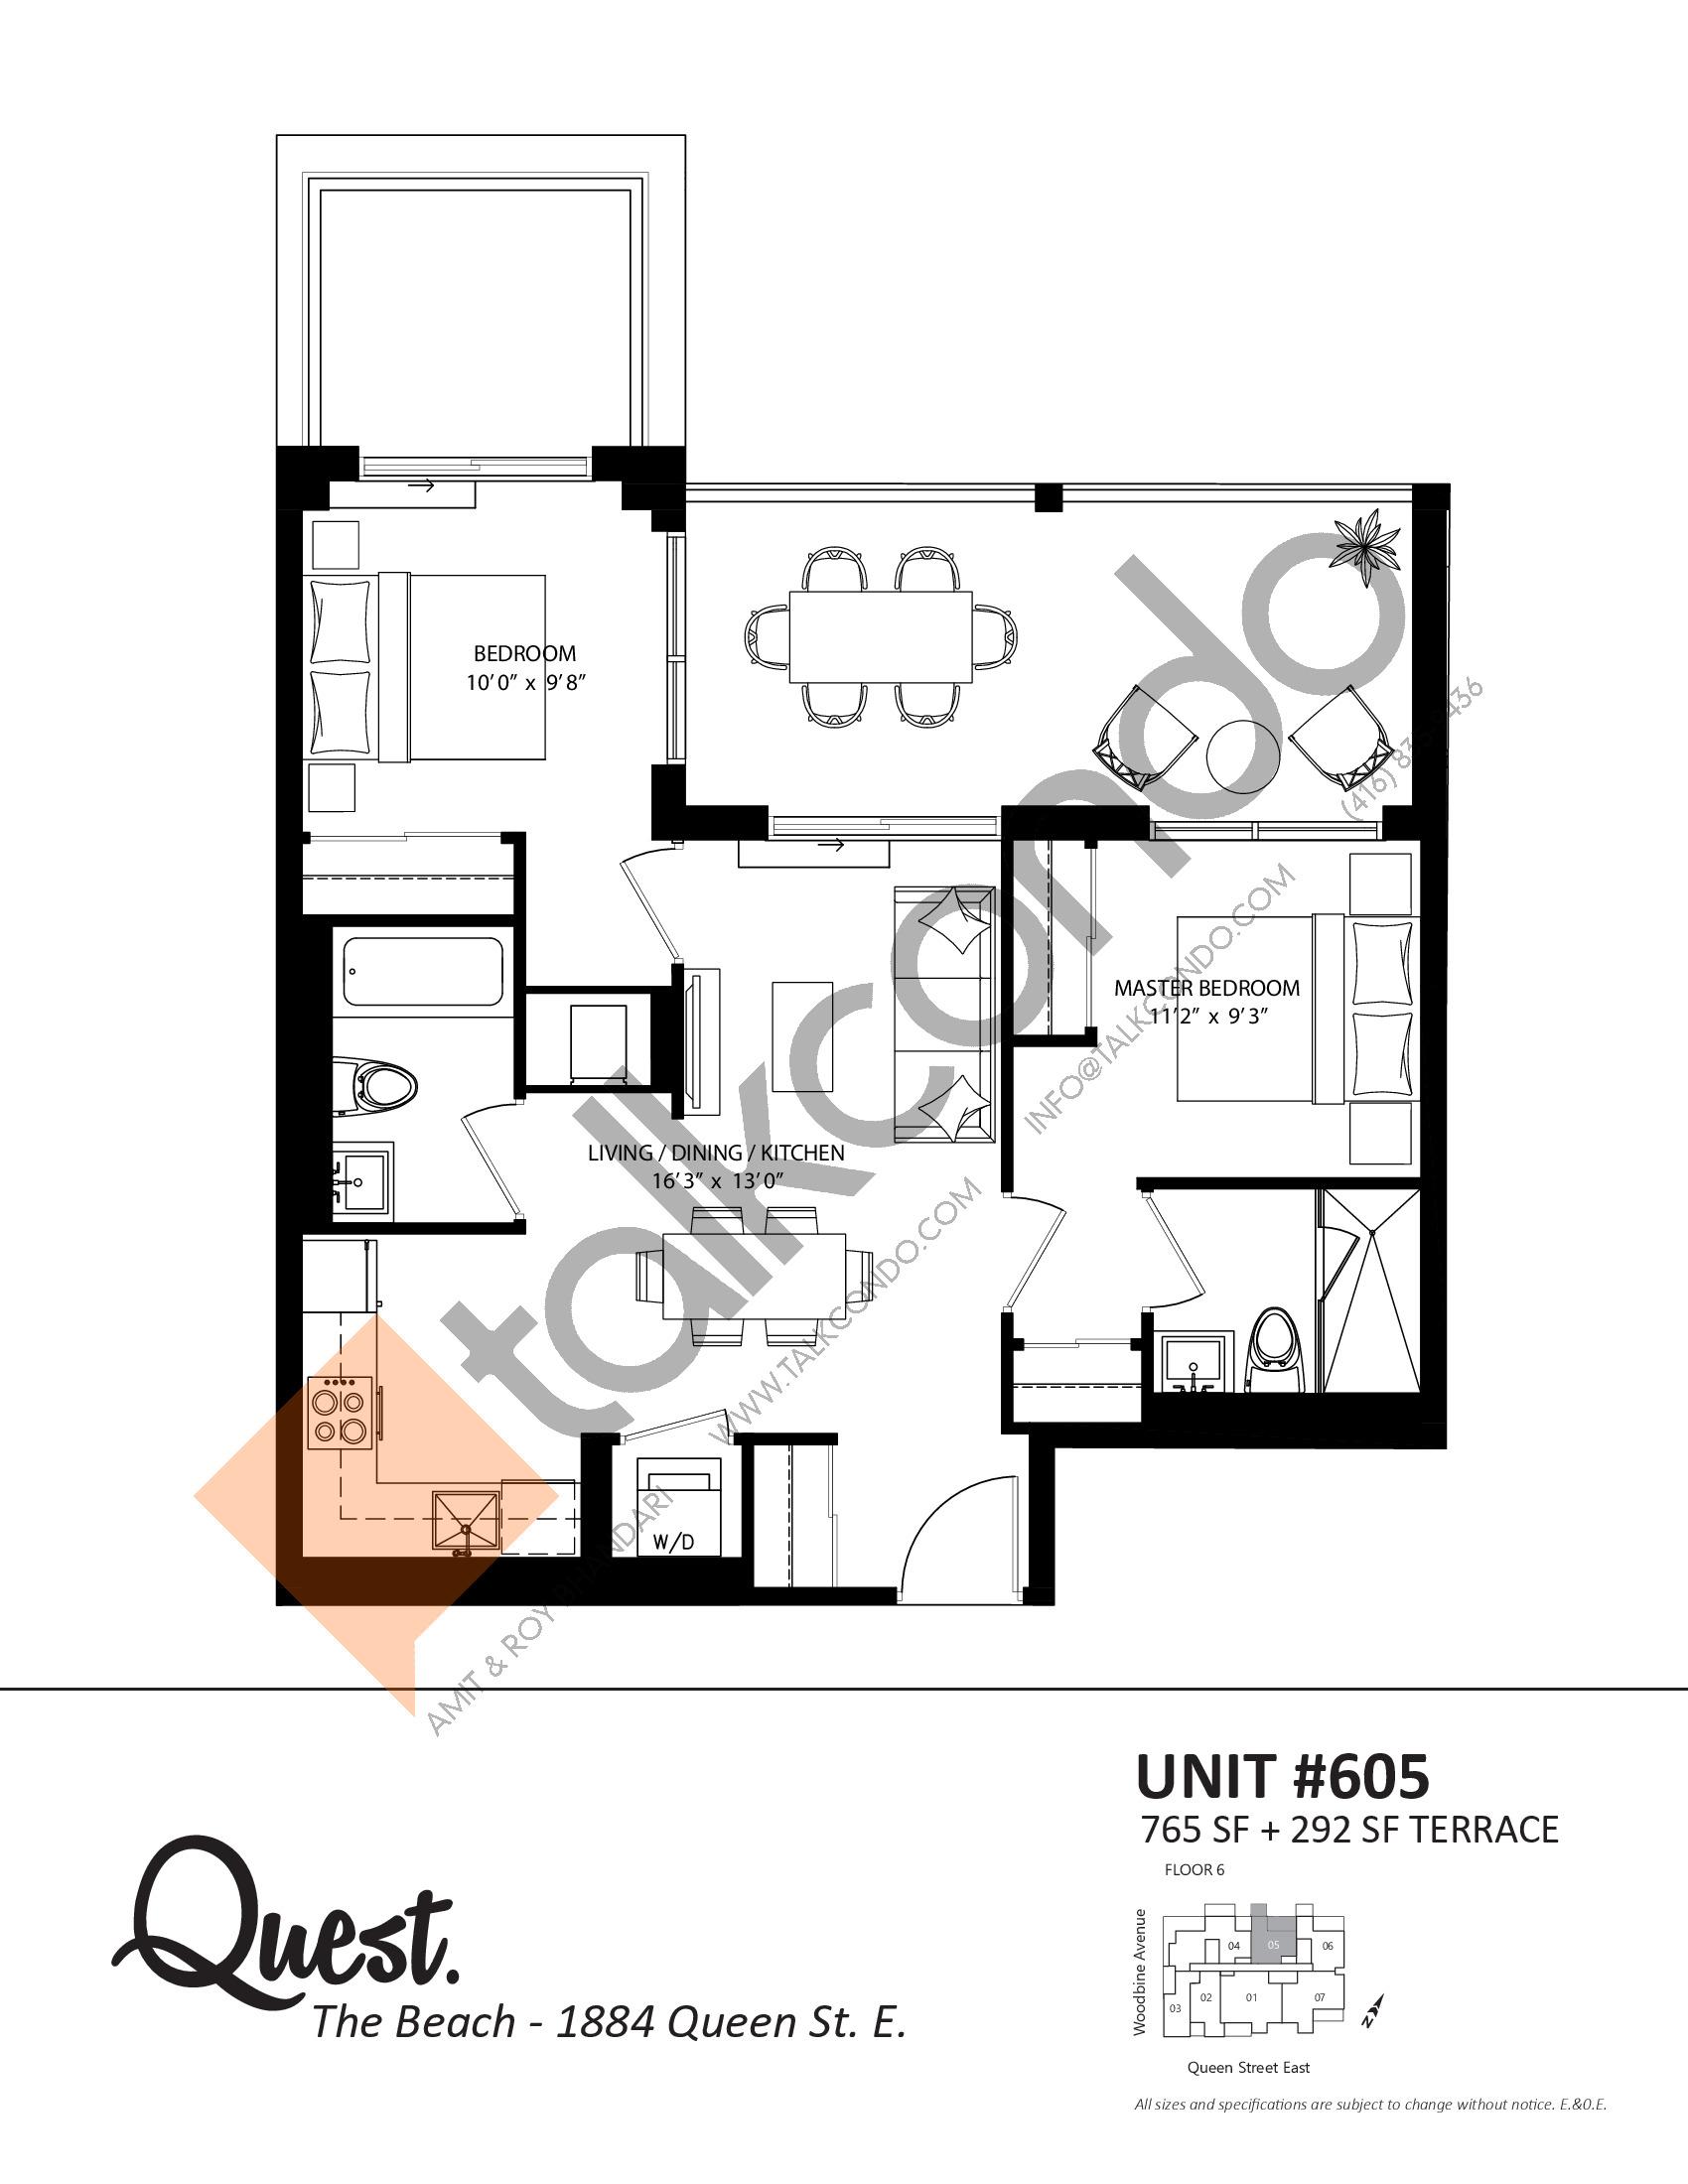 Unit 605 Floor Plan at Heartwood the Beach Condos - 765 sq.ft